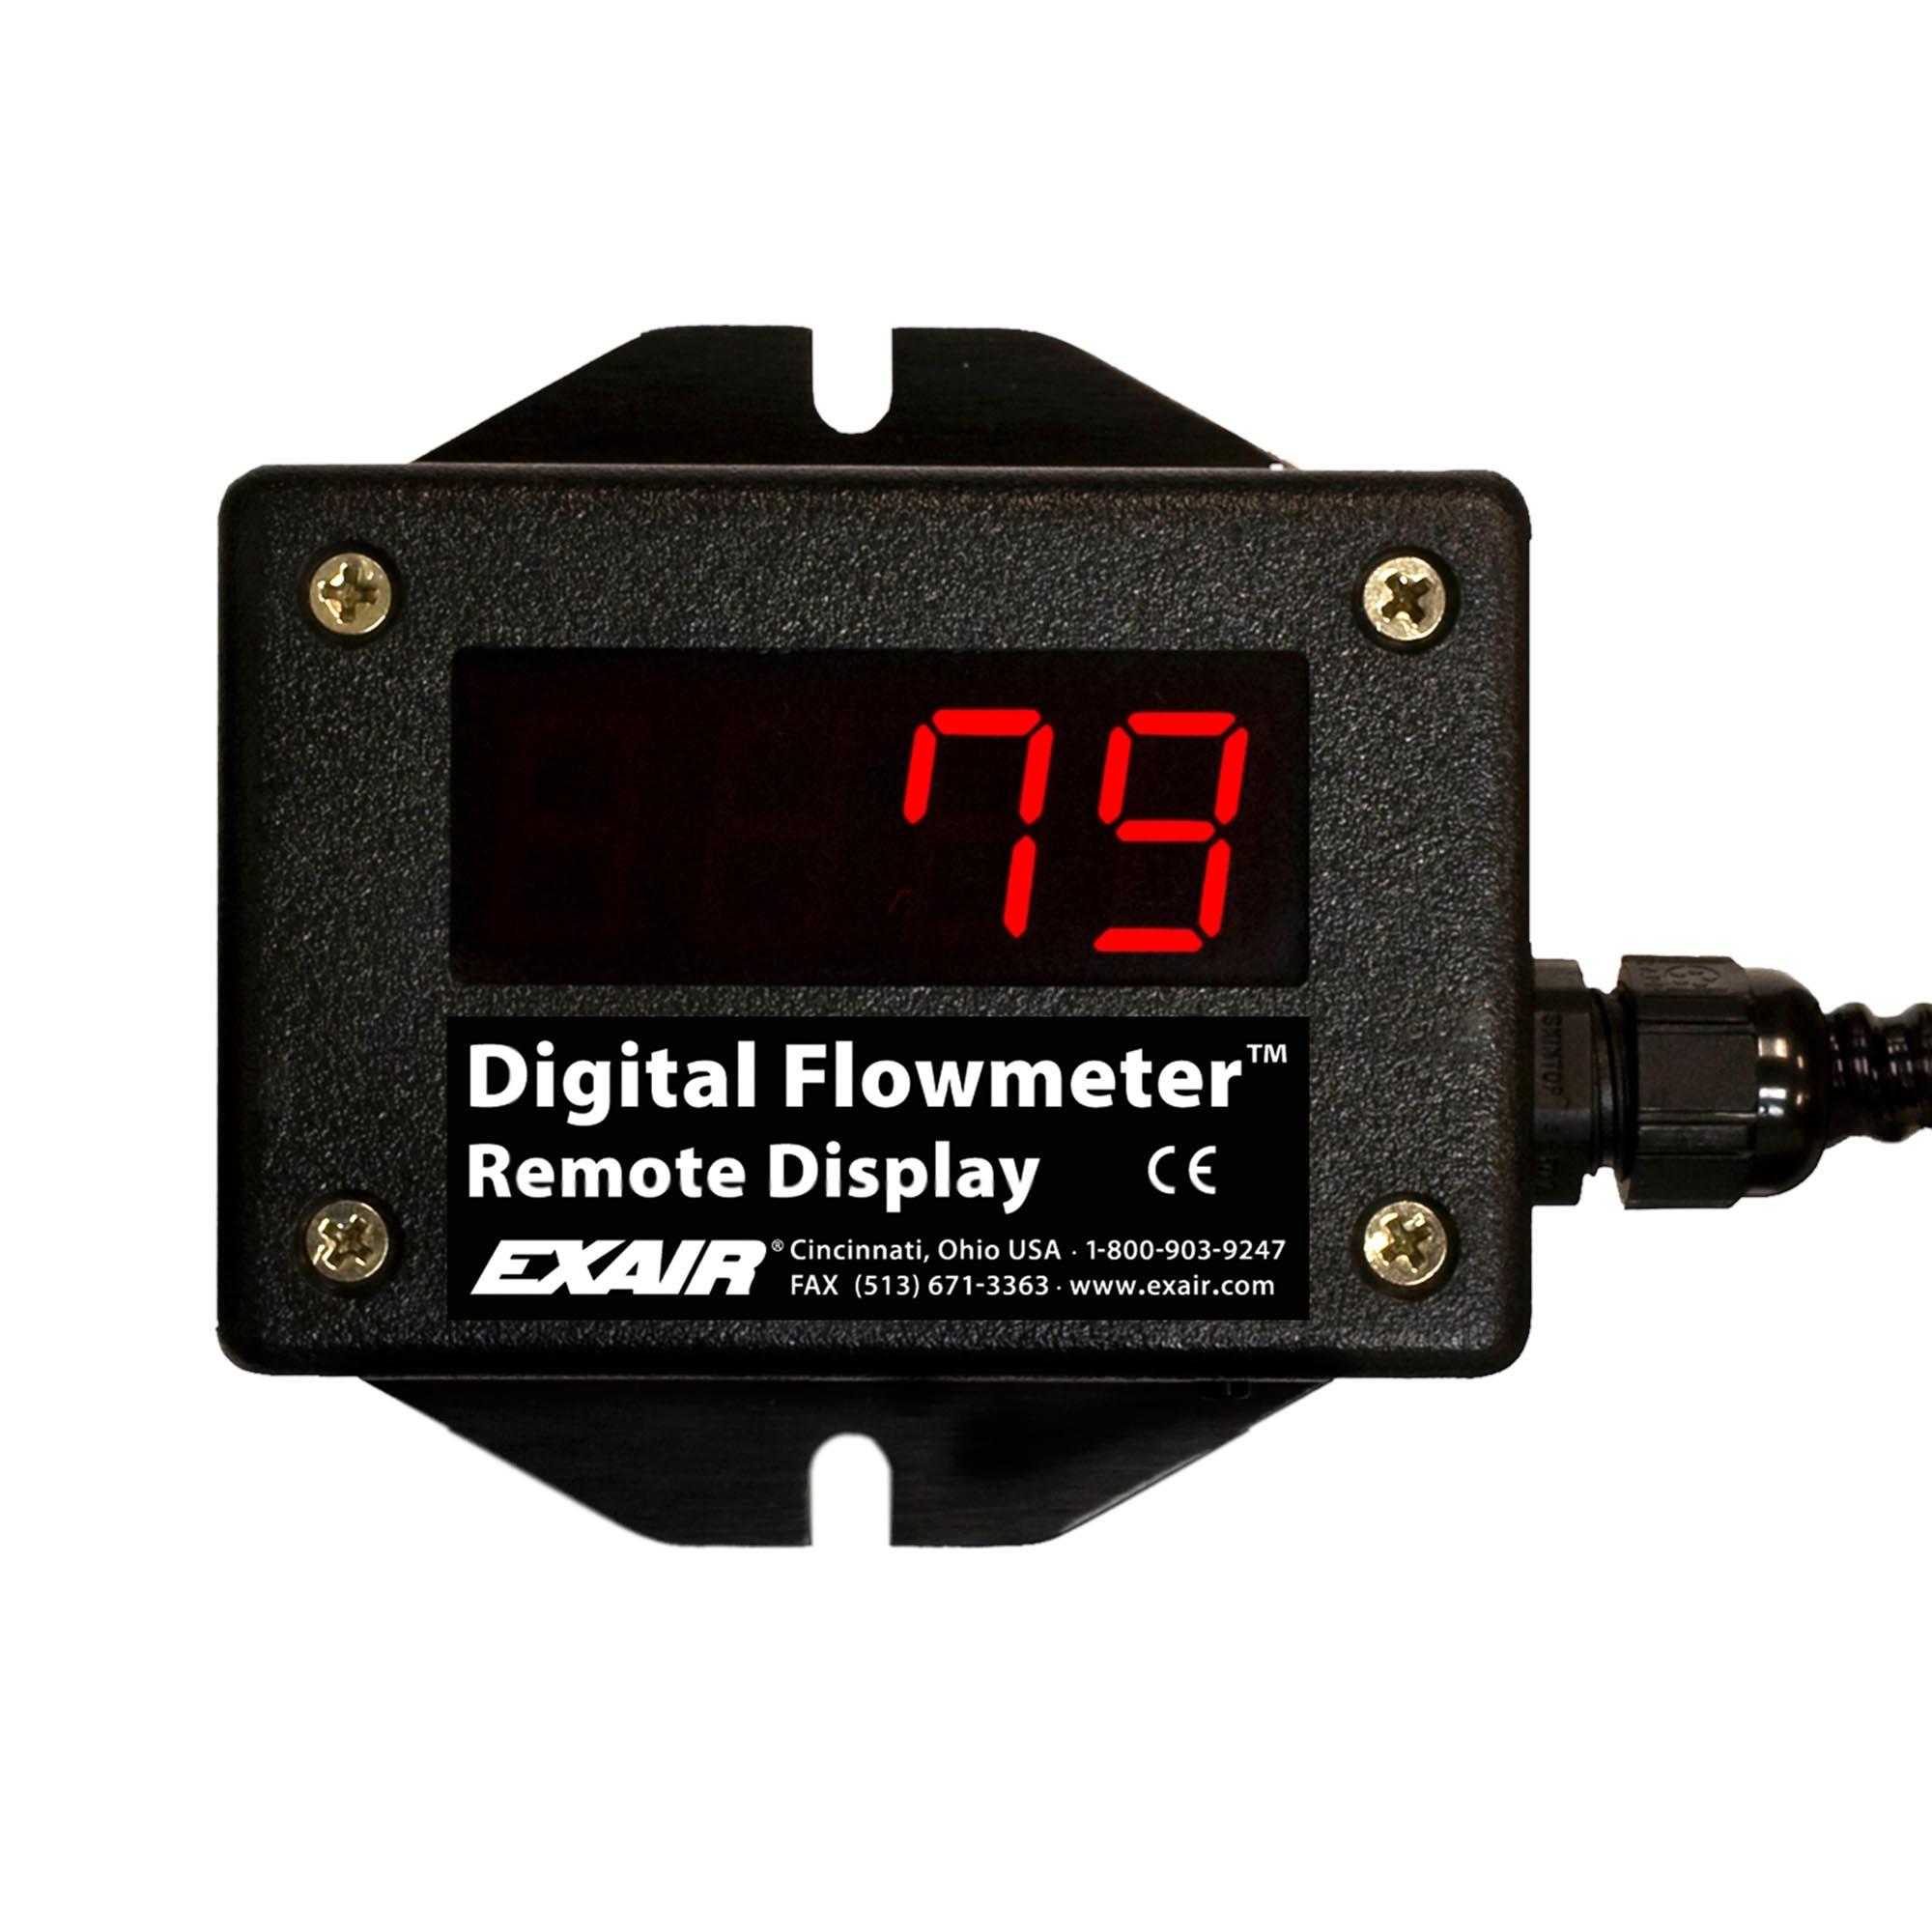 Model 9150 Summing Remote Display